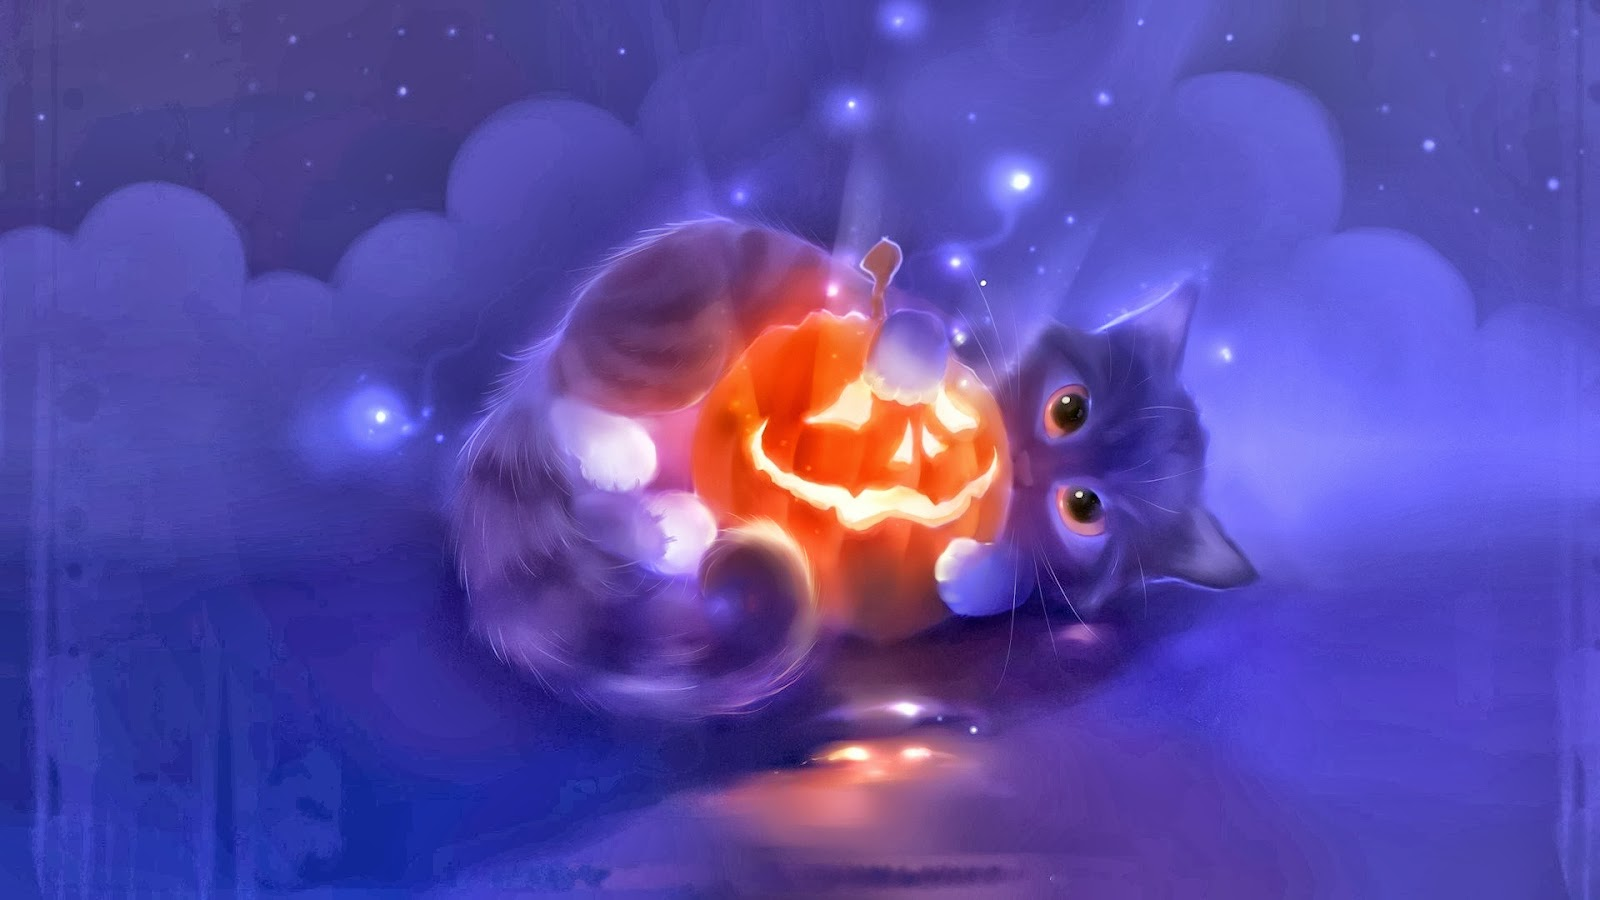 39 Cute Cat Halloween Wallpaper On Wallpapersafari